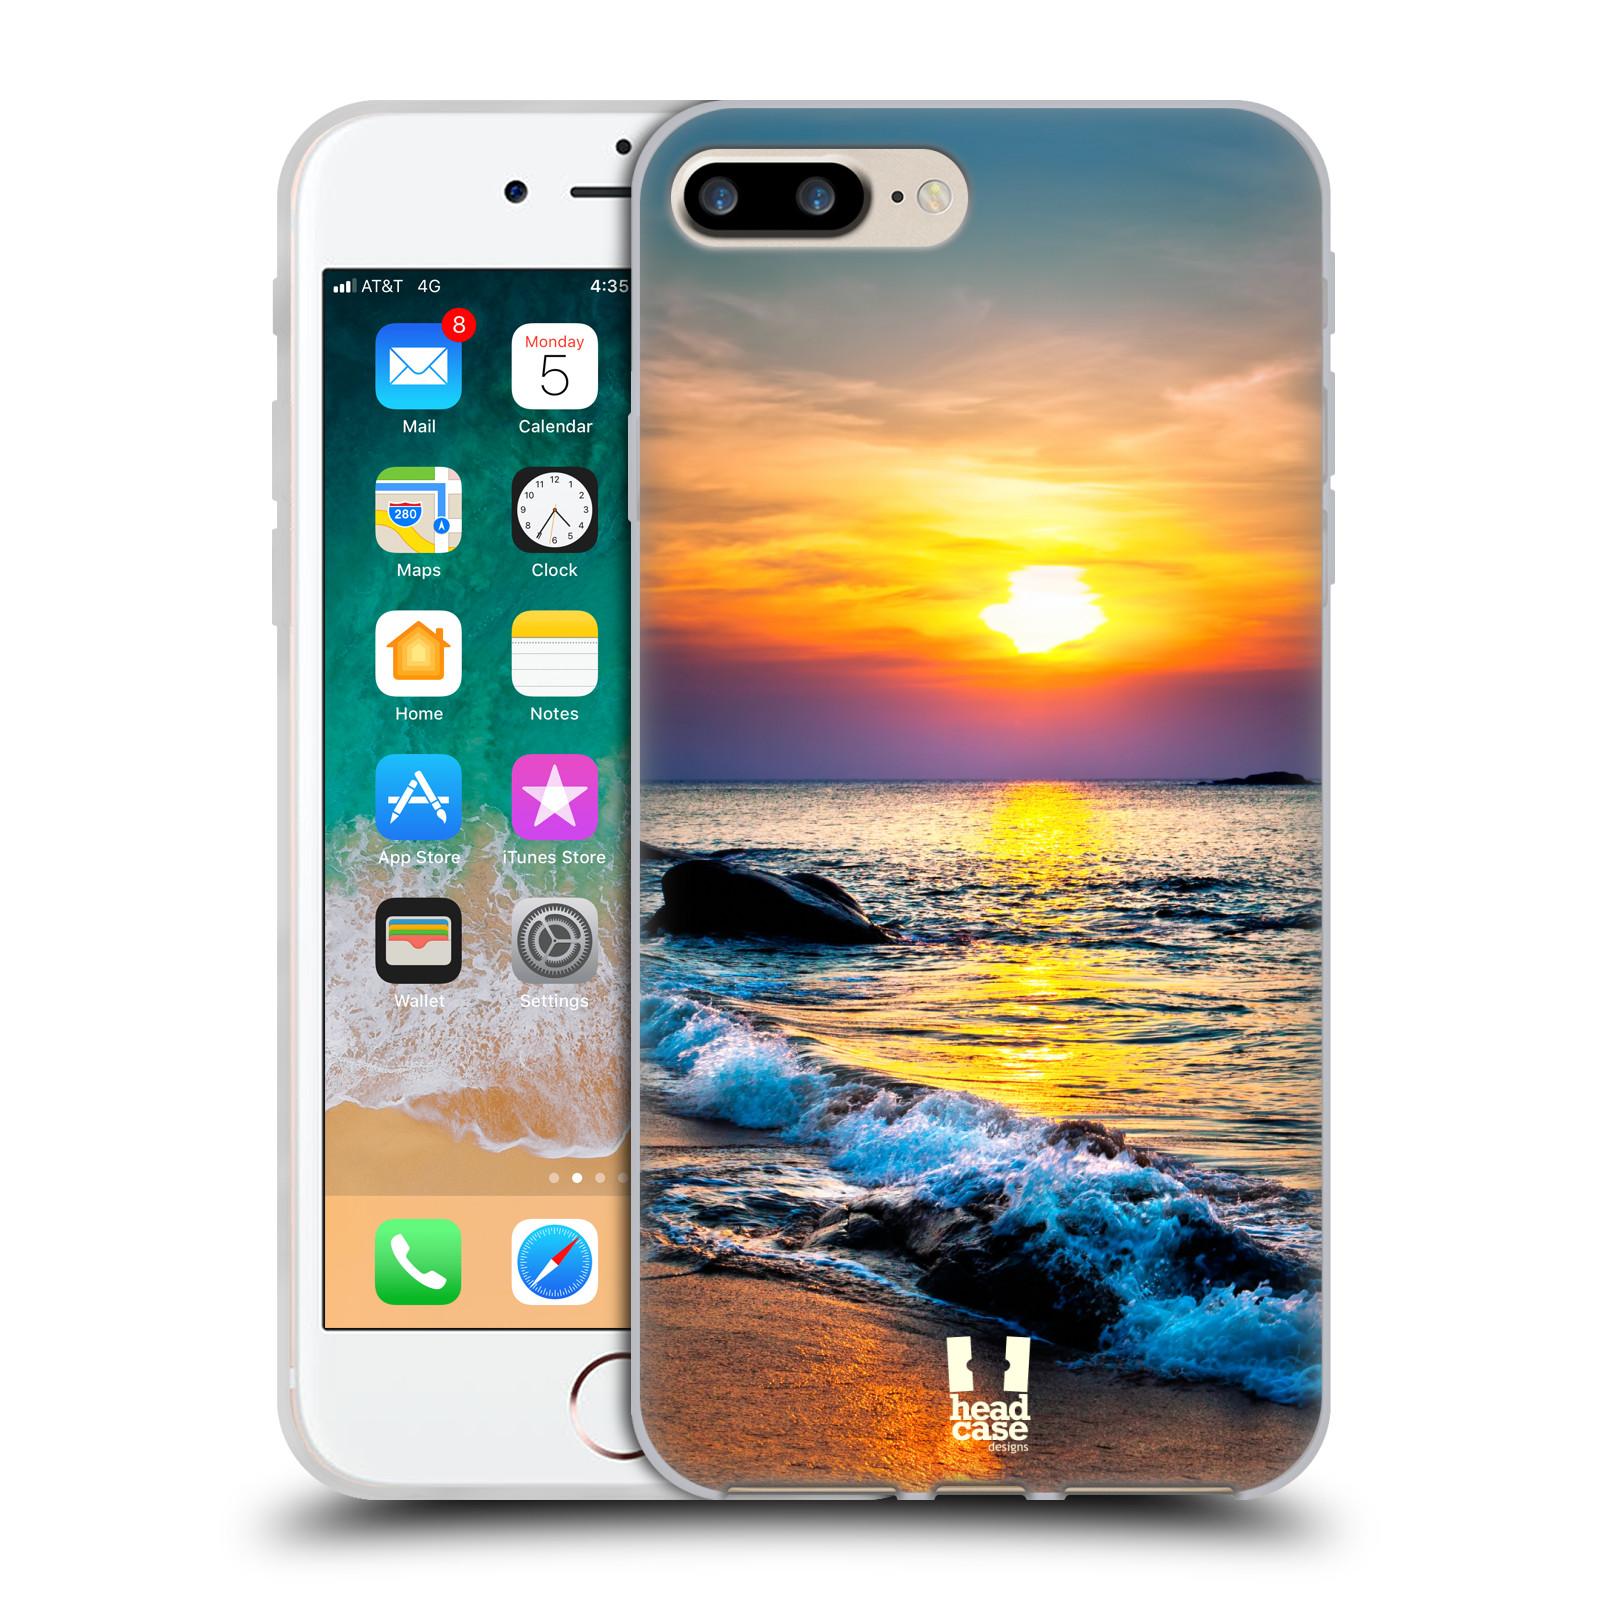 HEAD CASE silikonový obal na mobil Apple Iphone 7 PLUS vzor Pláže a Moře barevný západ slunce